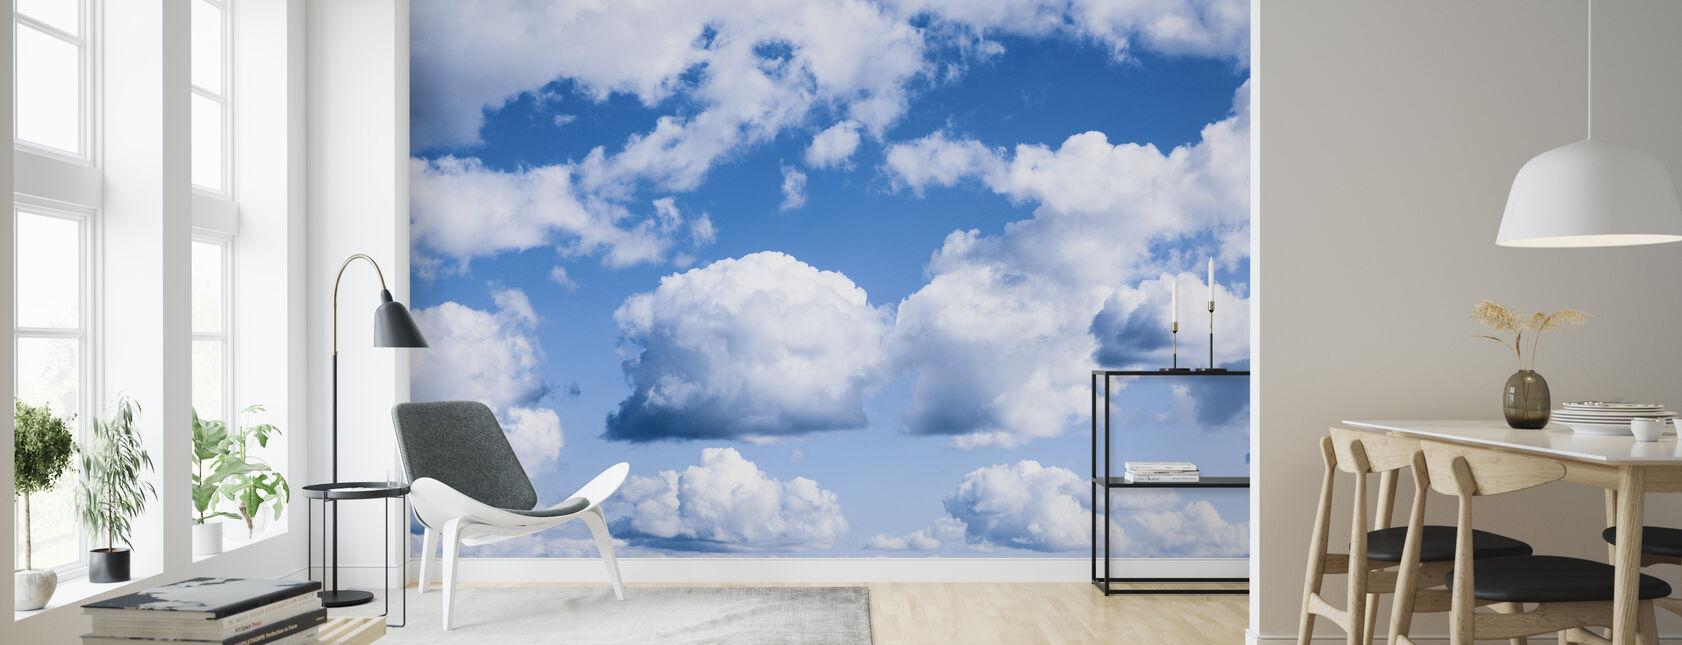 Cumulus pilvet - Tapetti - Olohuone